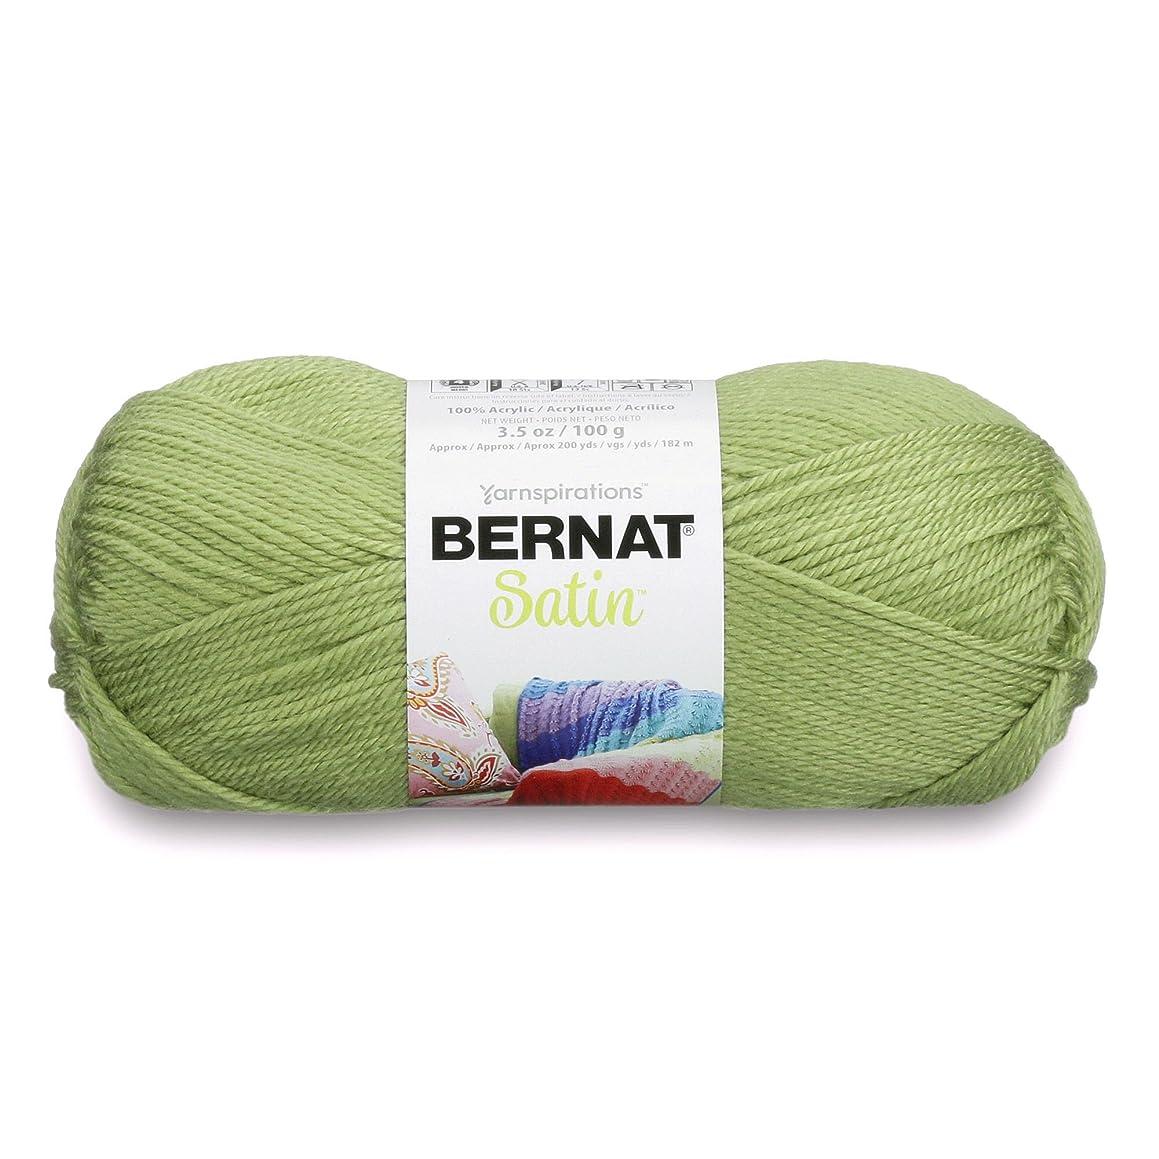 Bernat Satin Solid Yarn, 3.5 oz, Gauge 4 Medium Worsted, 100% Acrylic, Fern